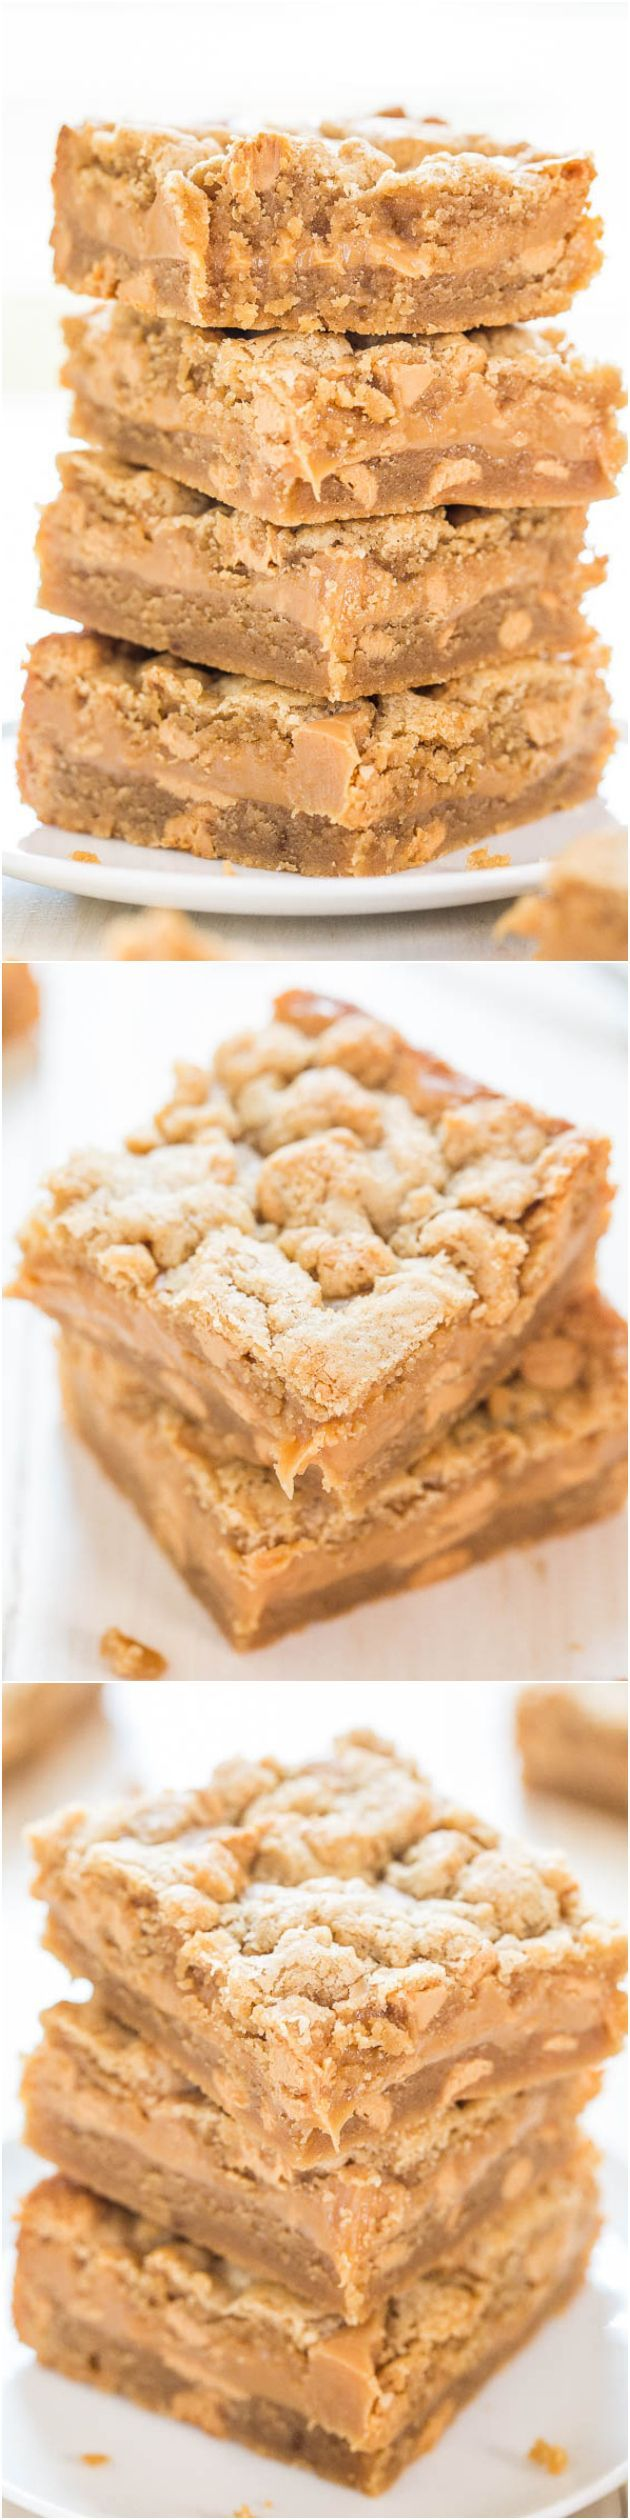 Peanut Butter Sandwich Cookie Bars